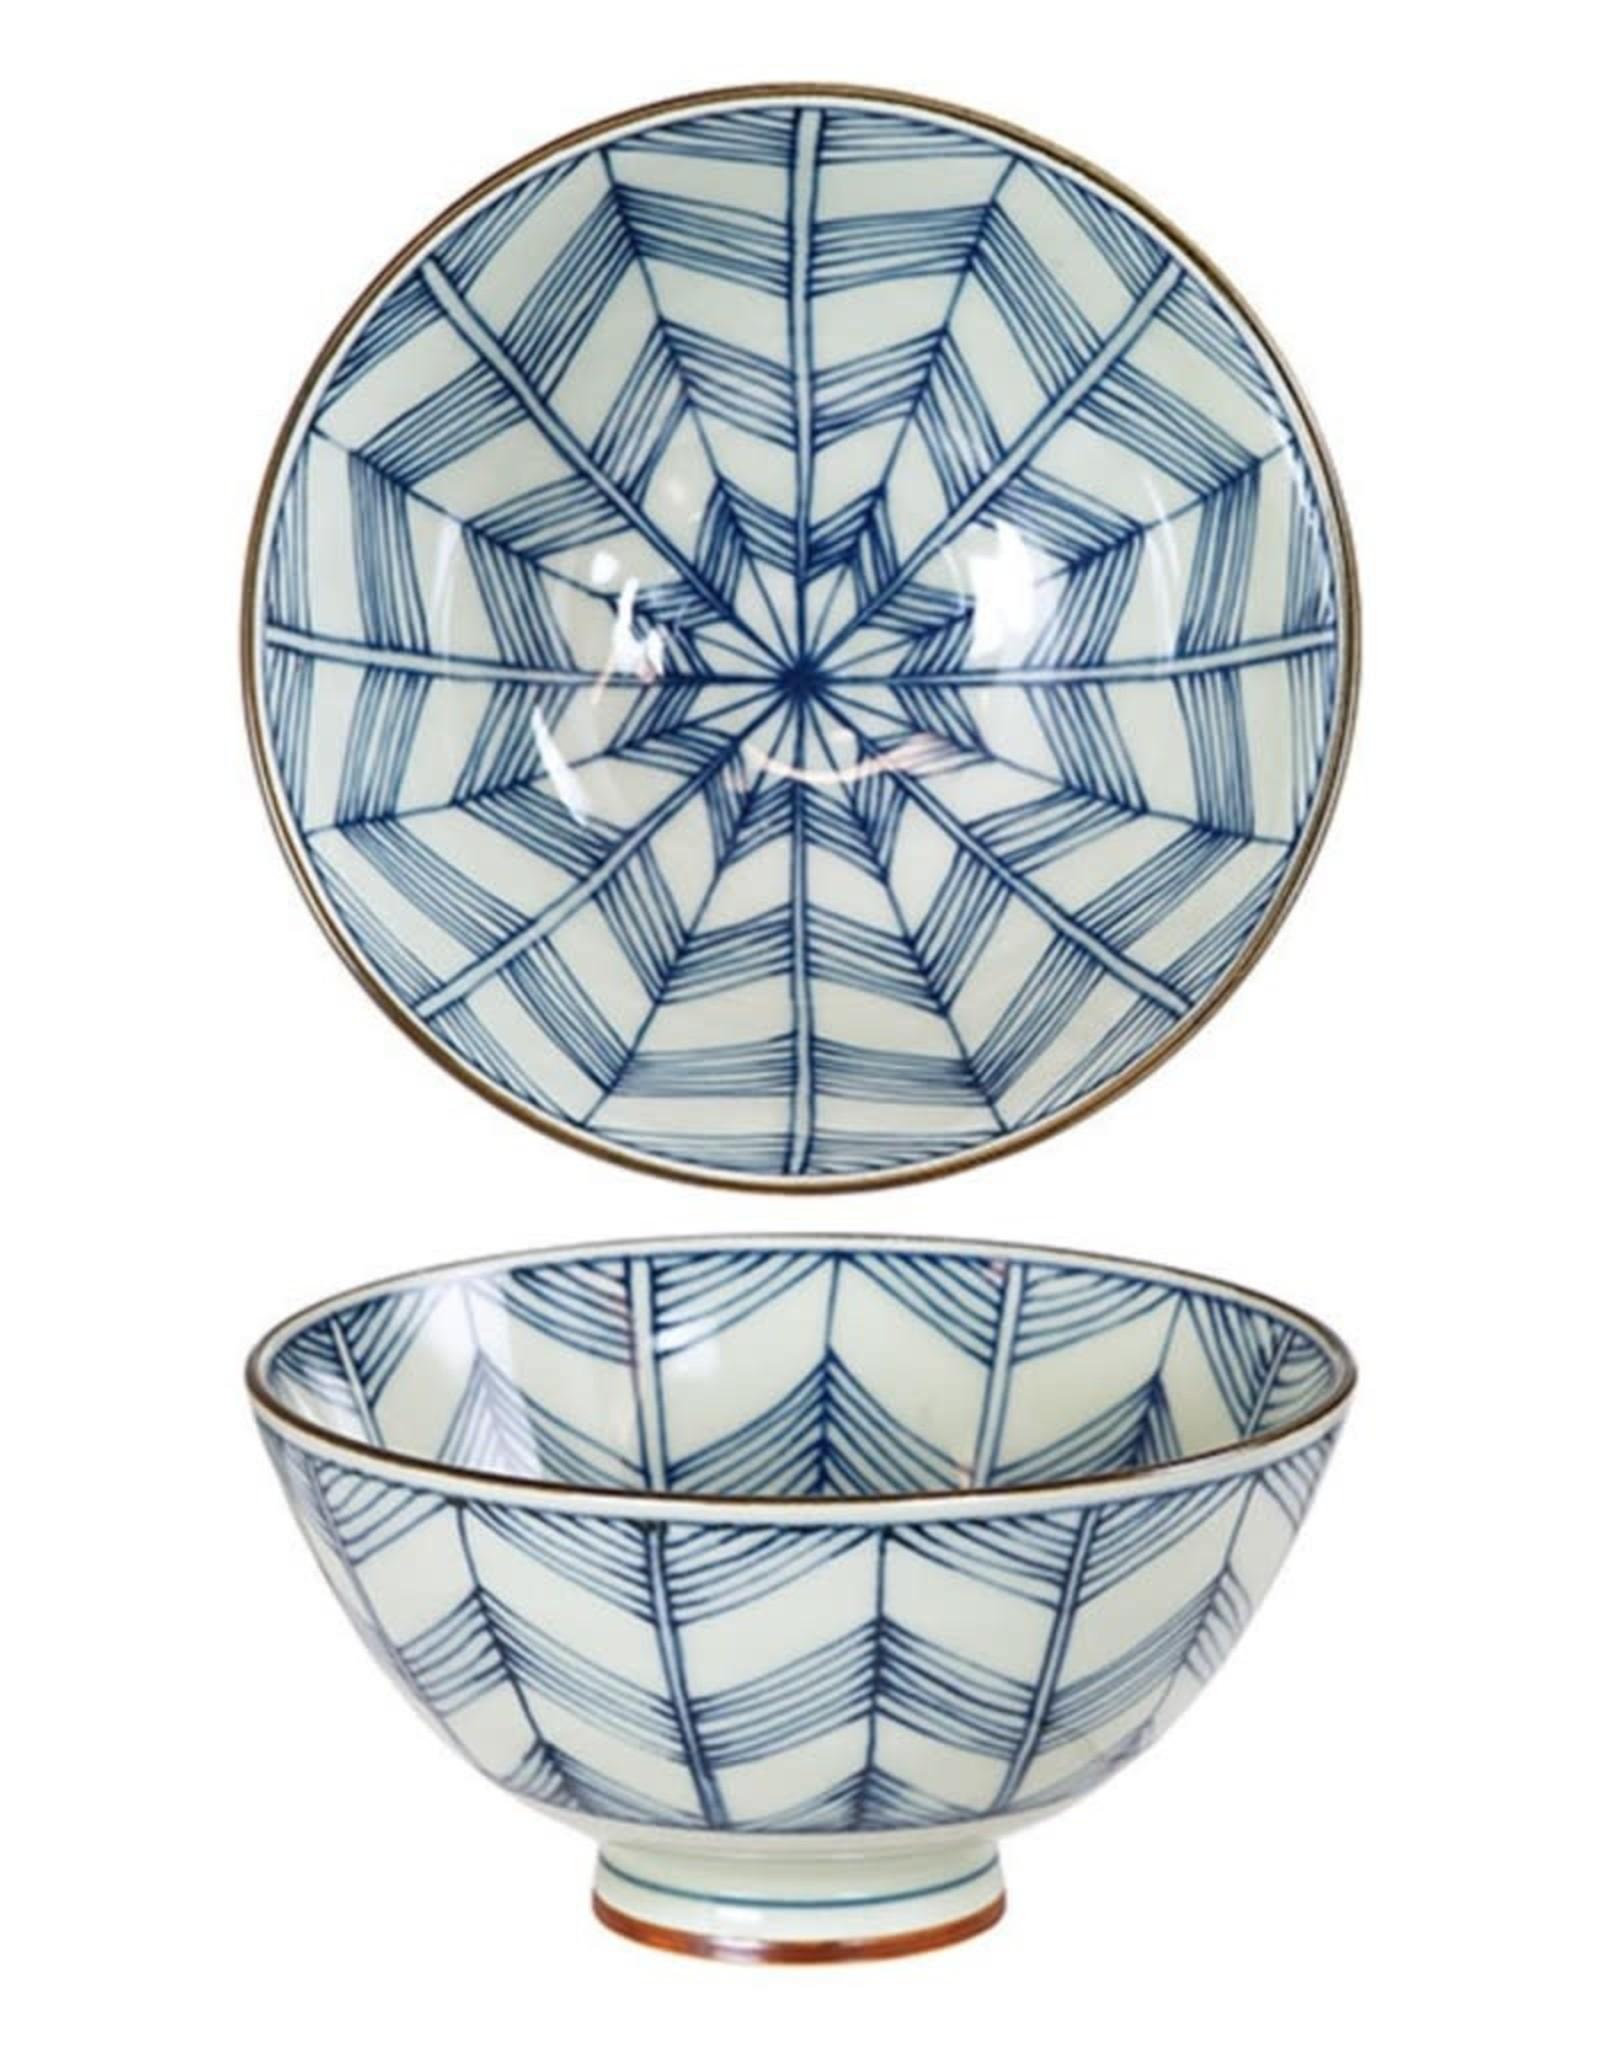 Kotobuki Trading Co. Inc Rice Bowl Antique Kimono Star